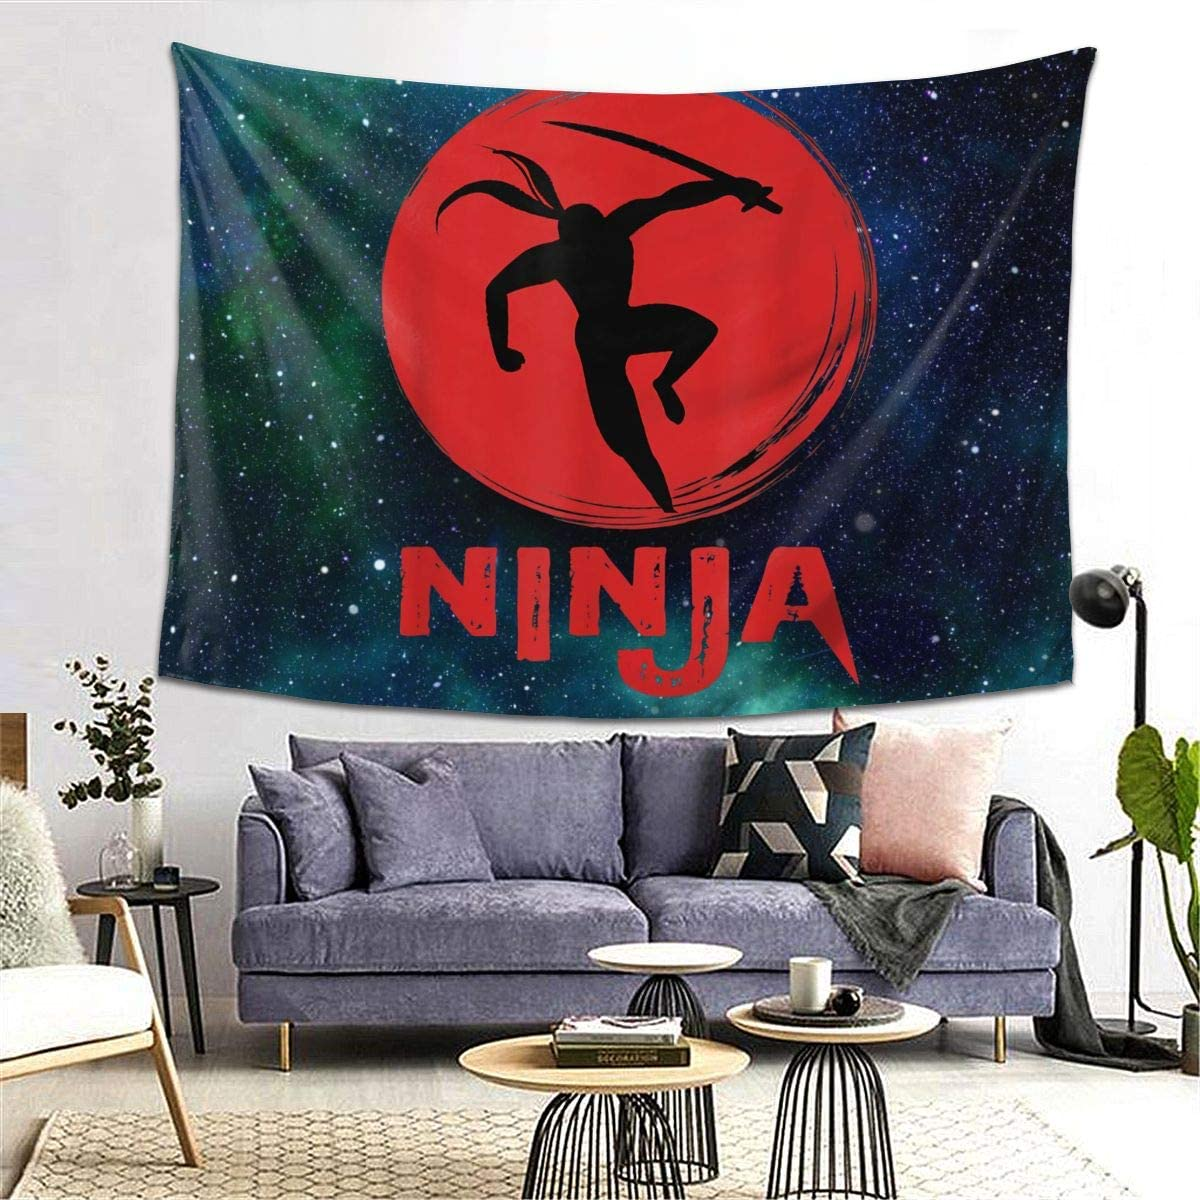 Ninja in Training - Cool Ninja Warrior Tapestry Wall Hanging Tapestry for Room 8060inch